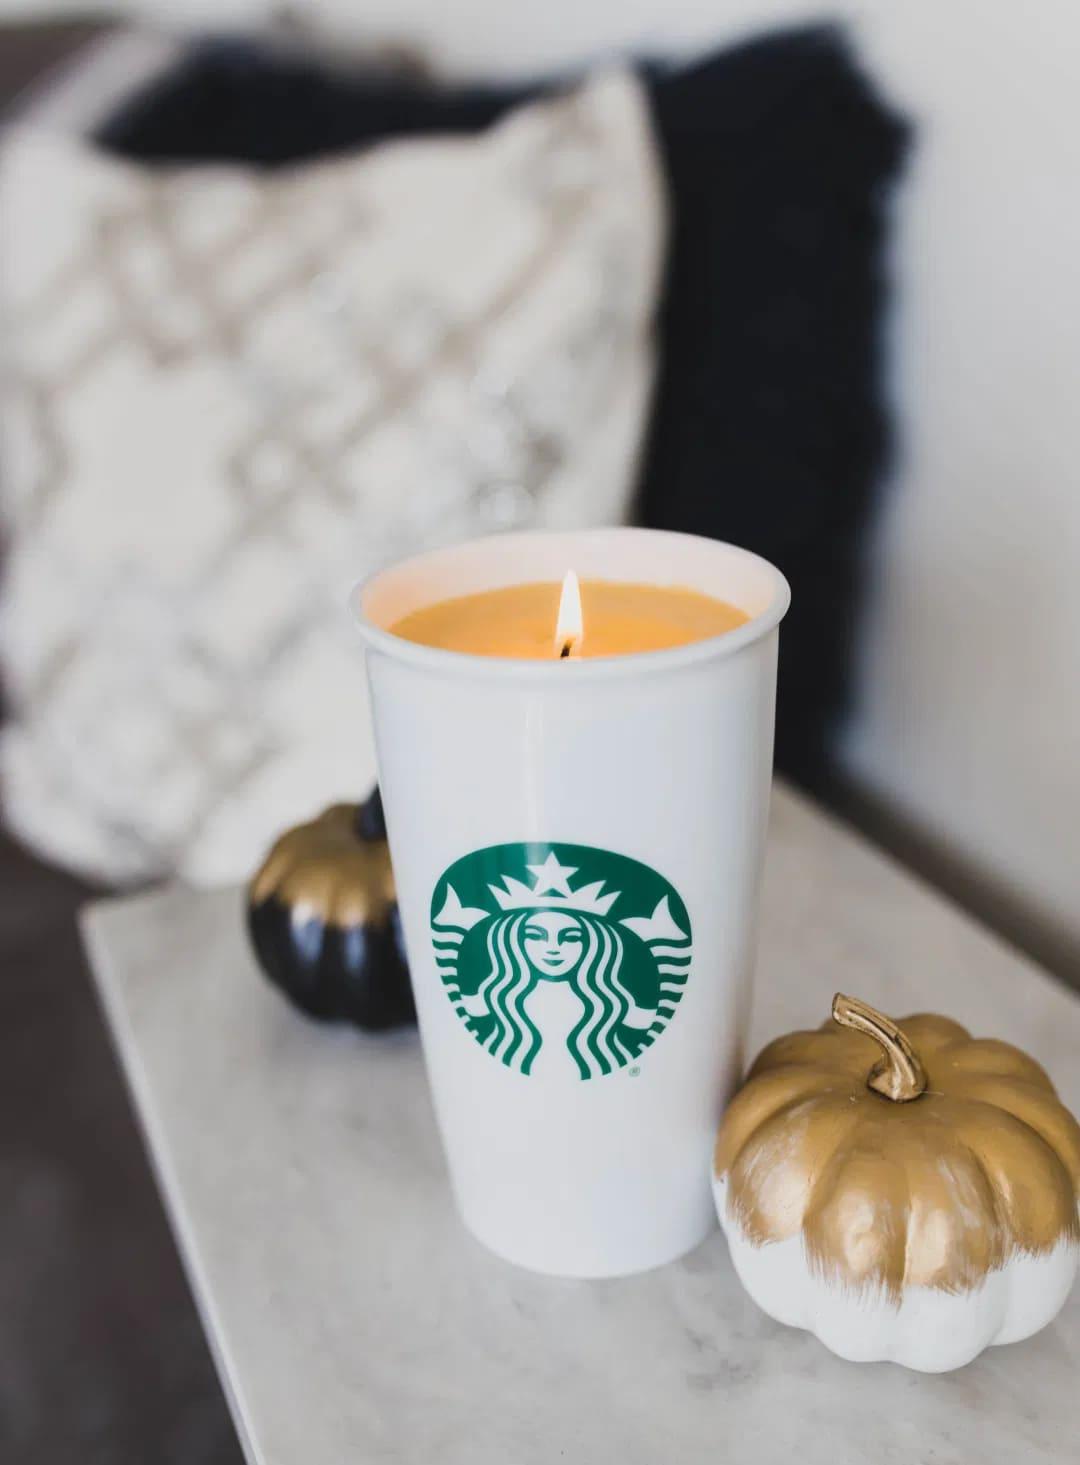 creare-candele-a-mano-5